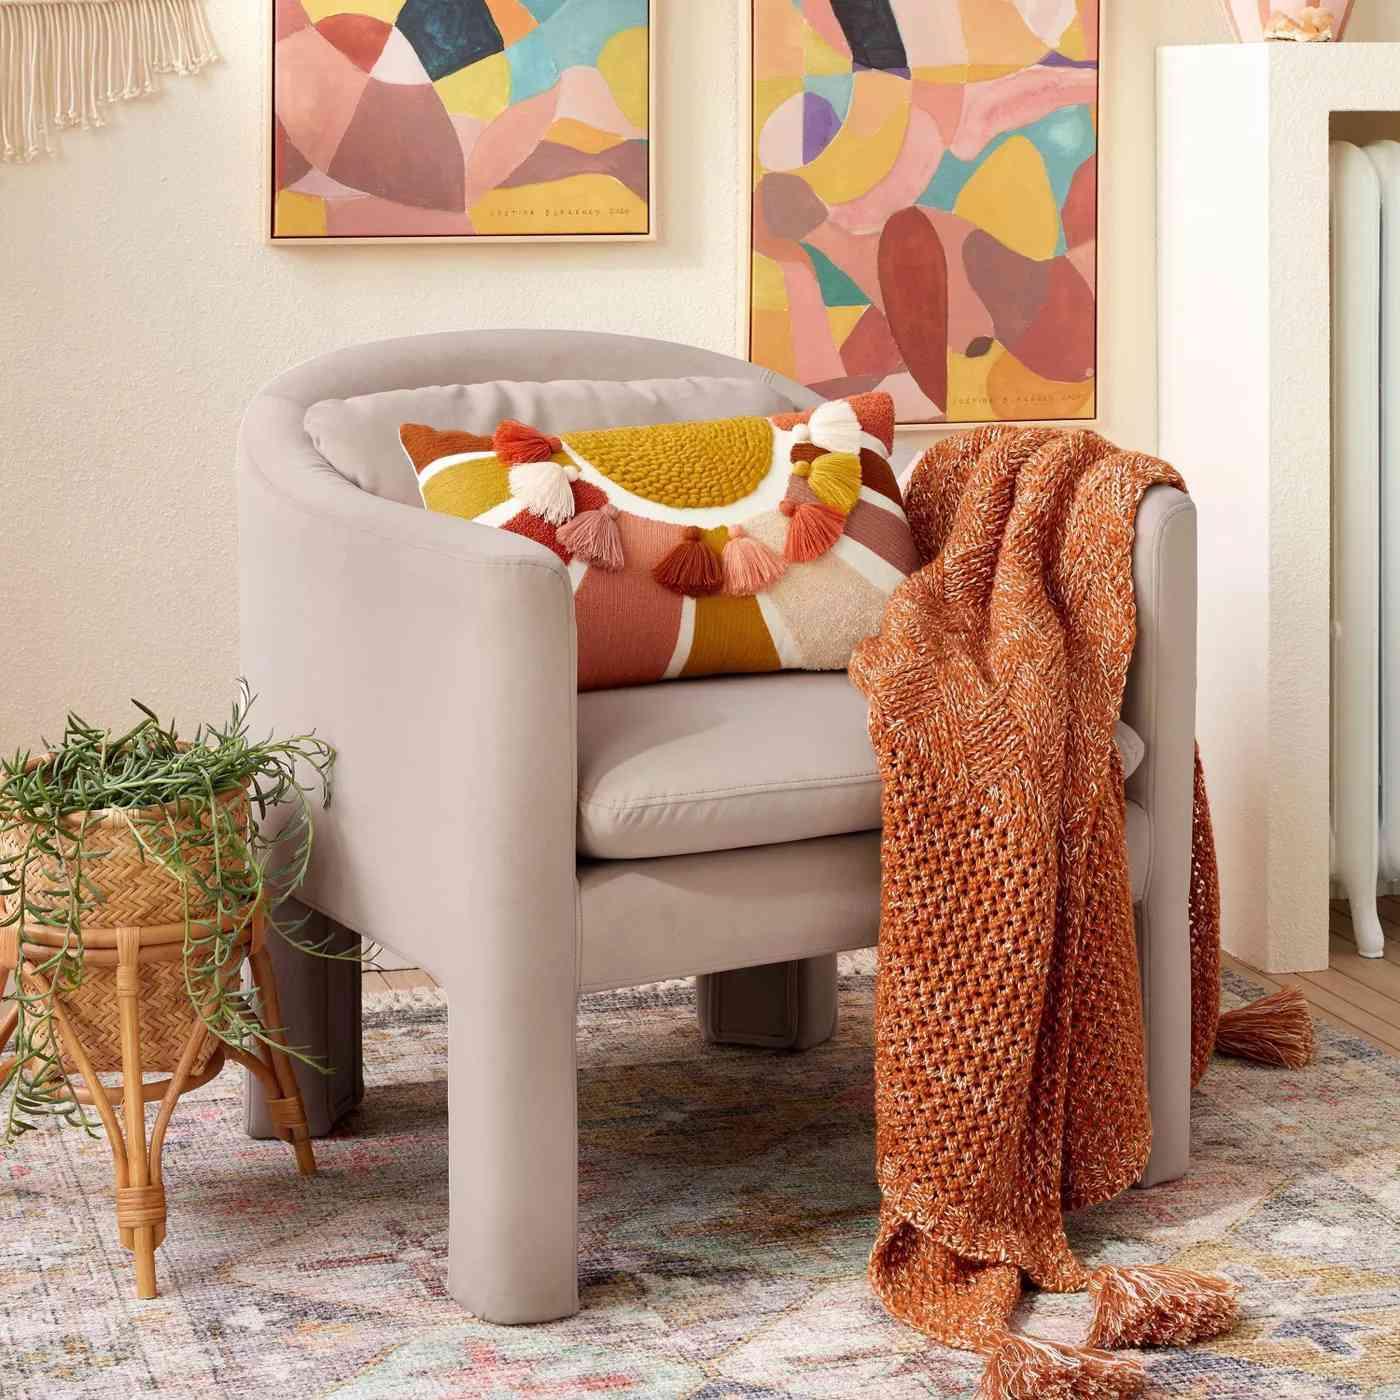 Embroidered Sun Lumbar Throw Pillow on chair.